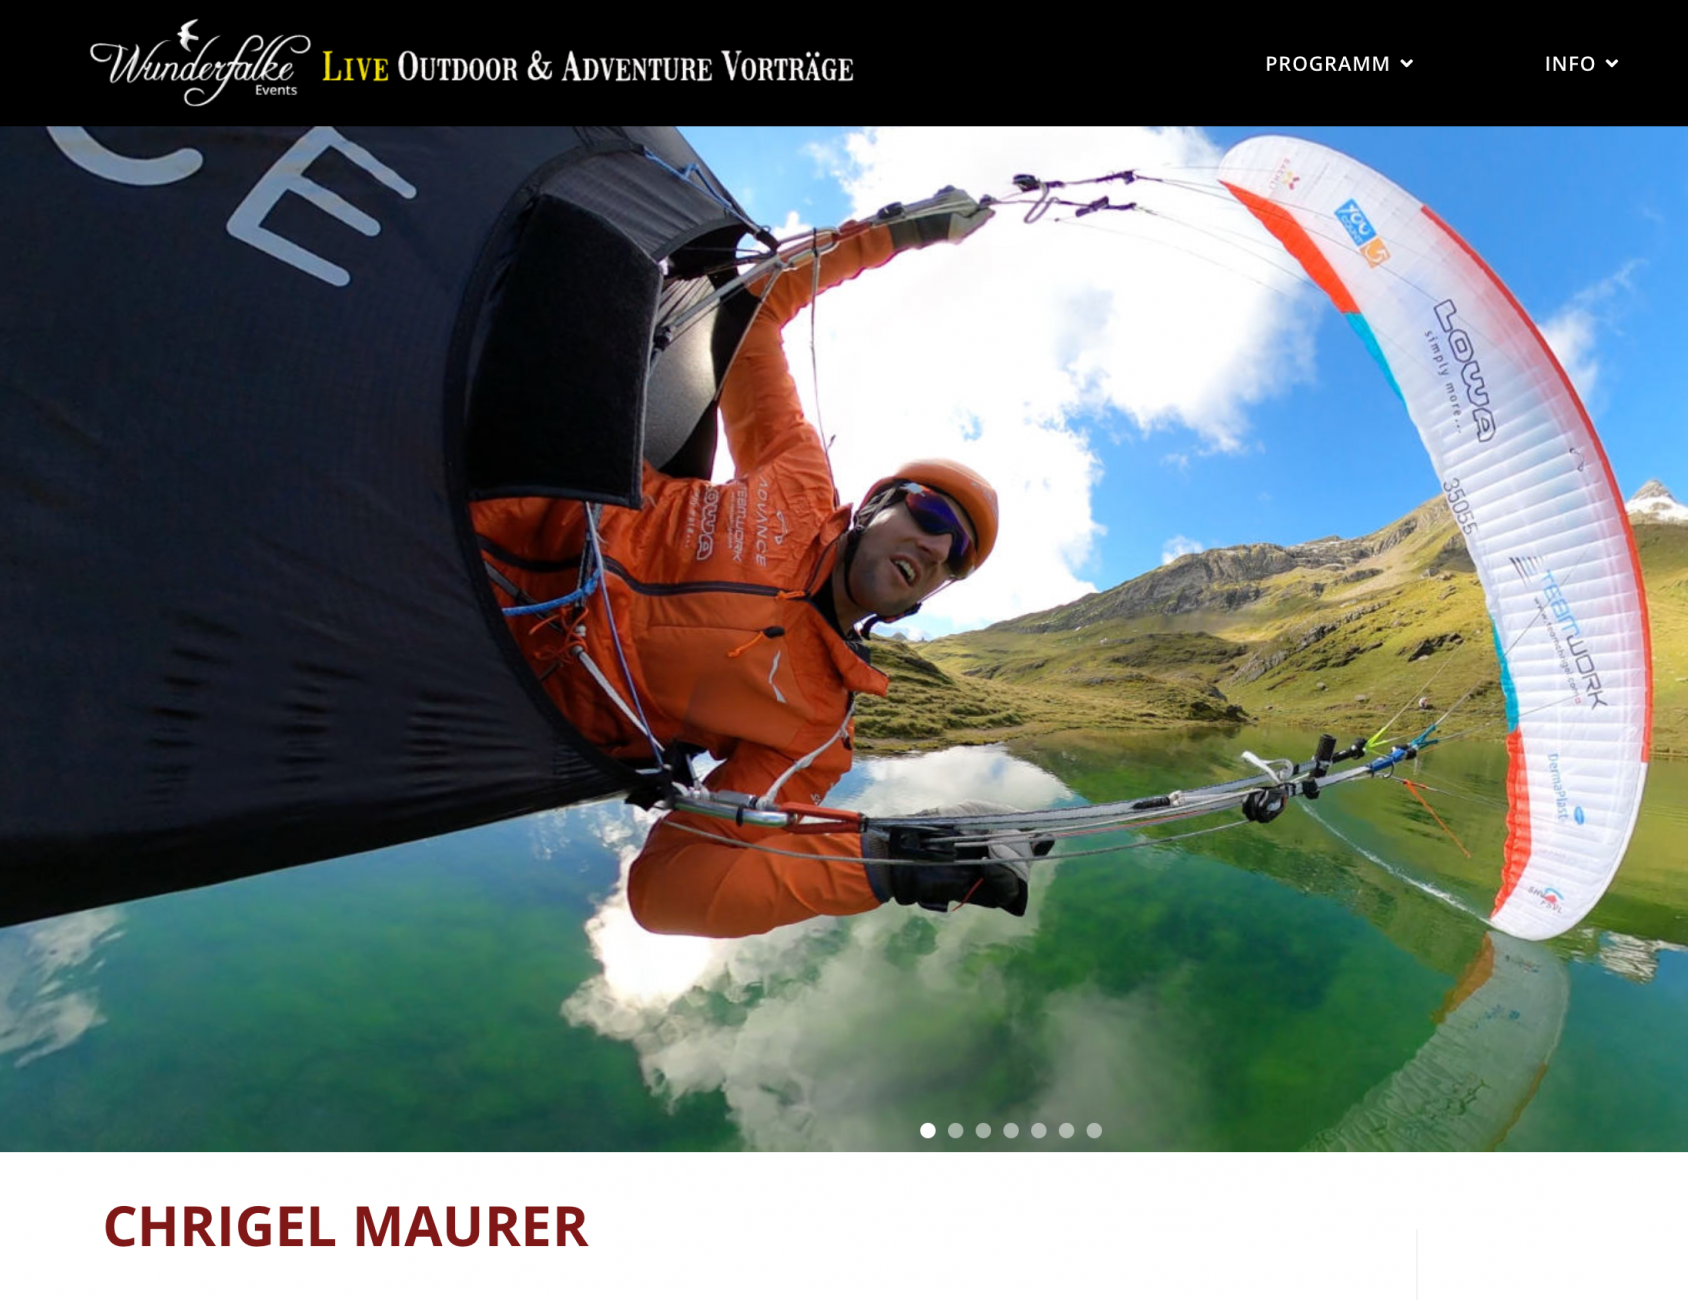 Save the Date! 14.11.2021 Chrigel Maurer in Bad Tölz+ Rahmenprogramm